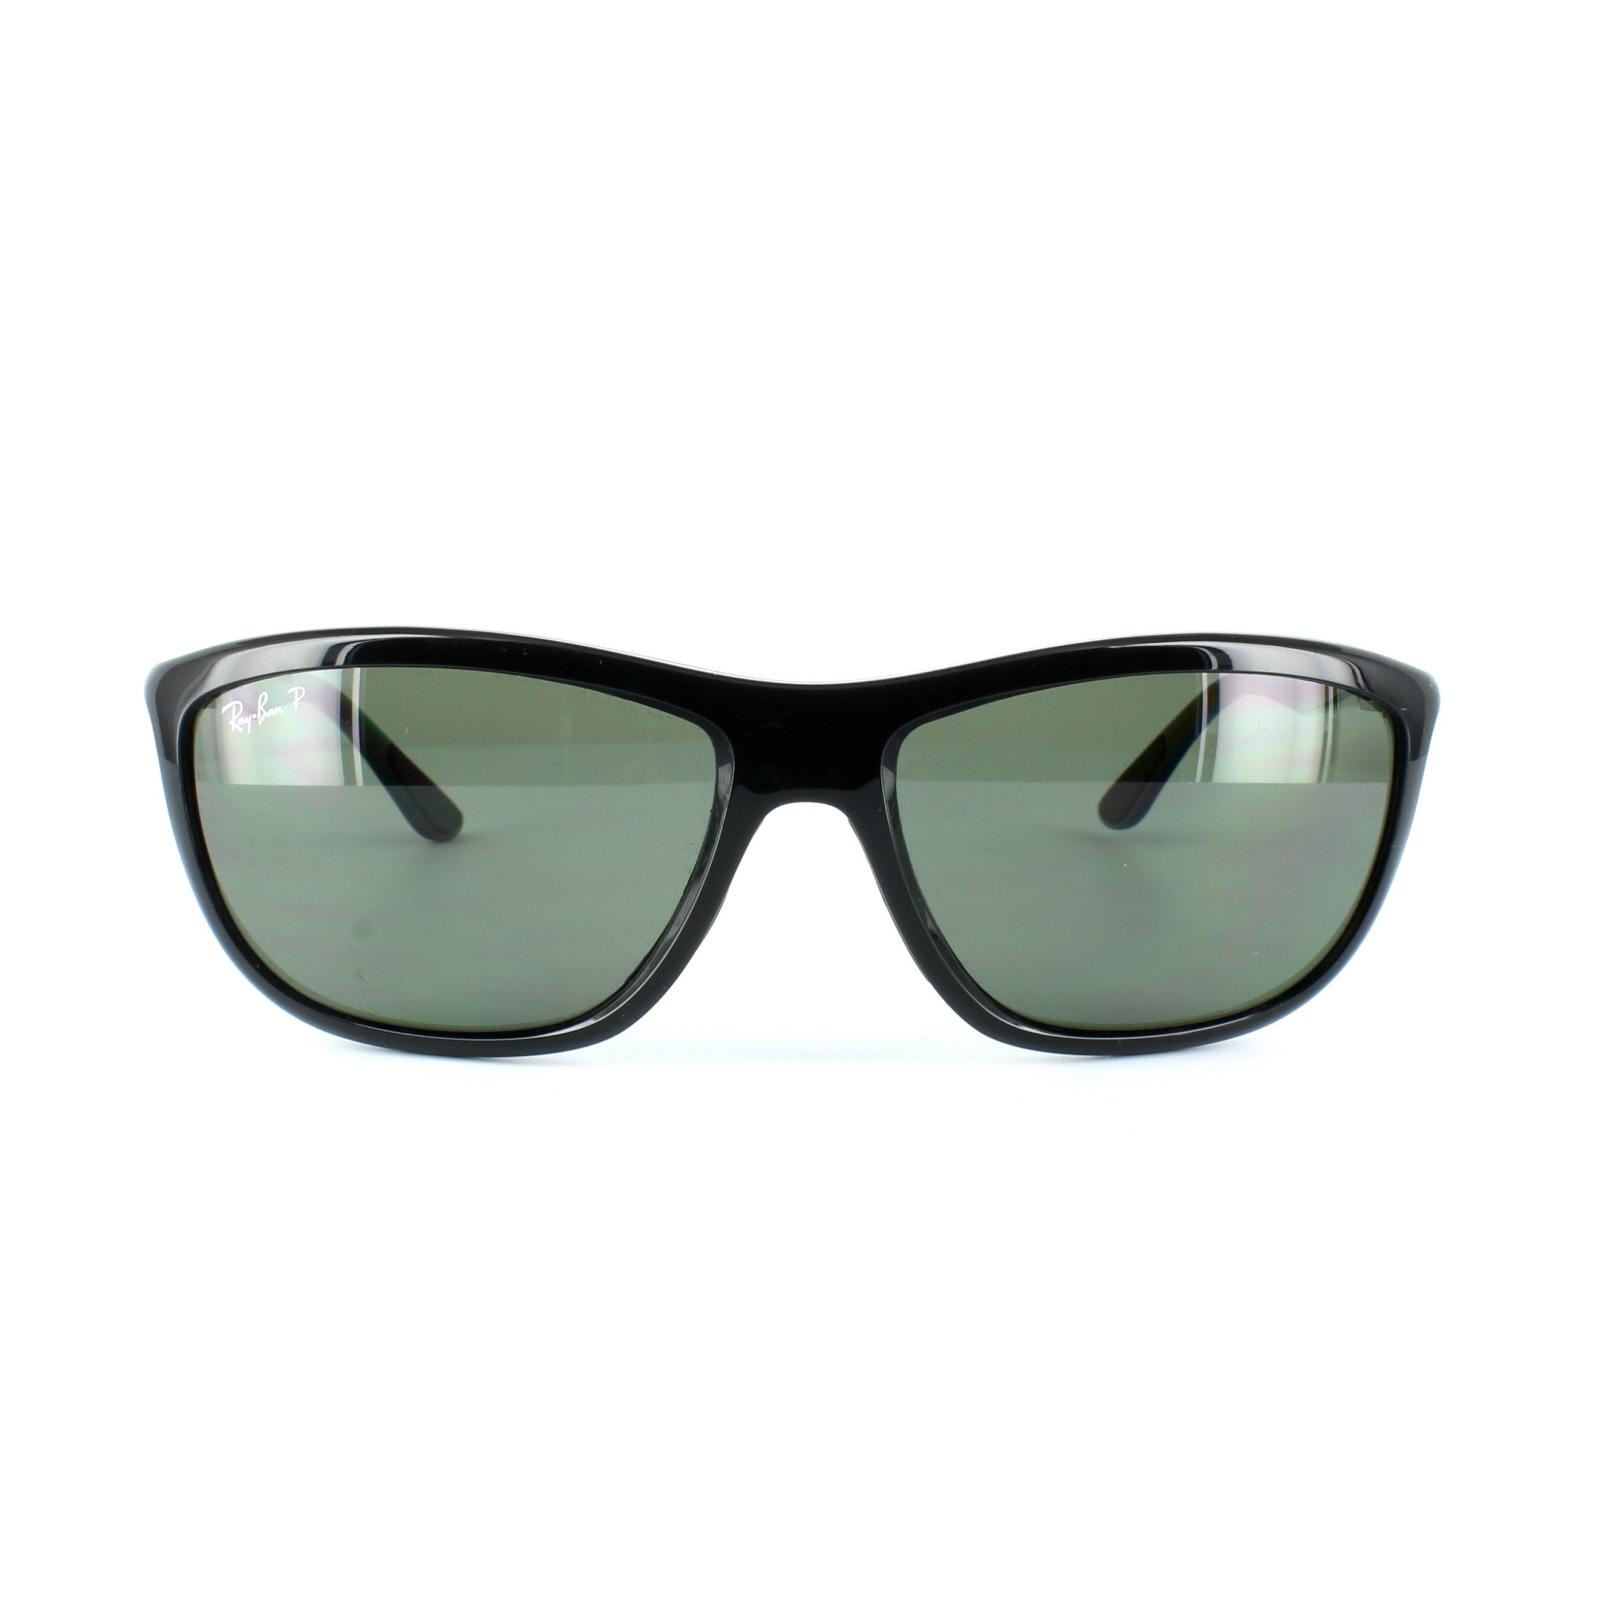 5b2d29b391 Ray Ban Big Glamour Polarized Wrap Sunglasses « Heritage Malta